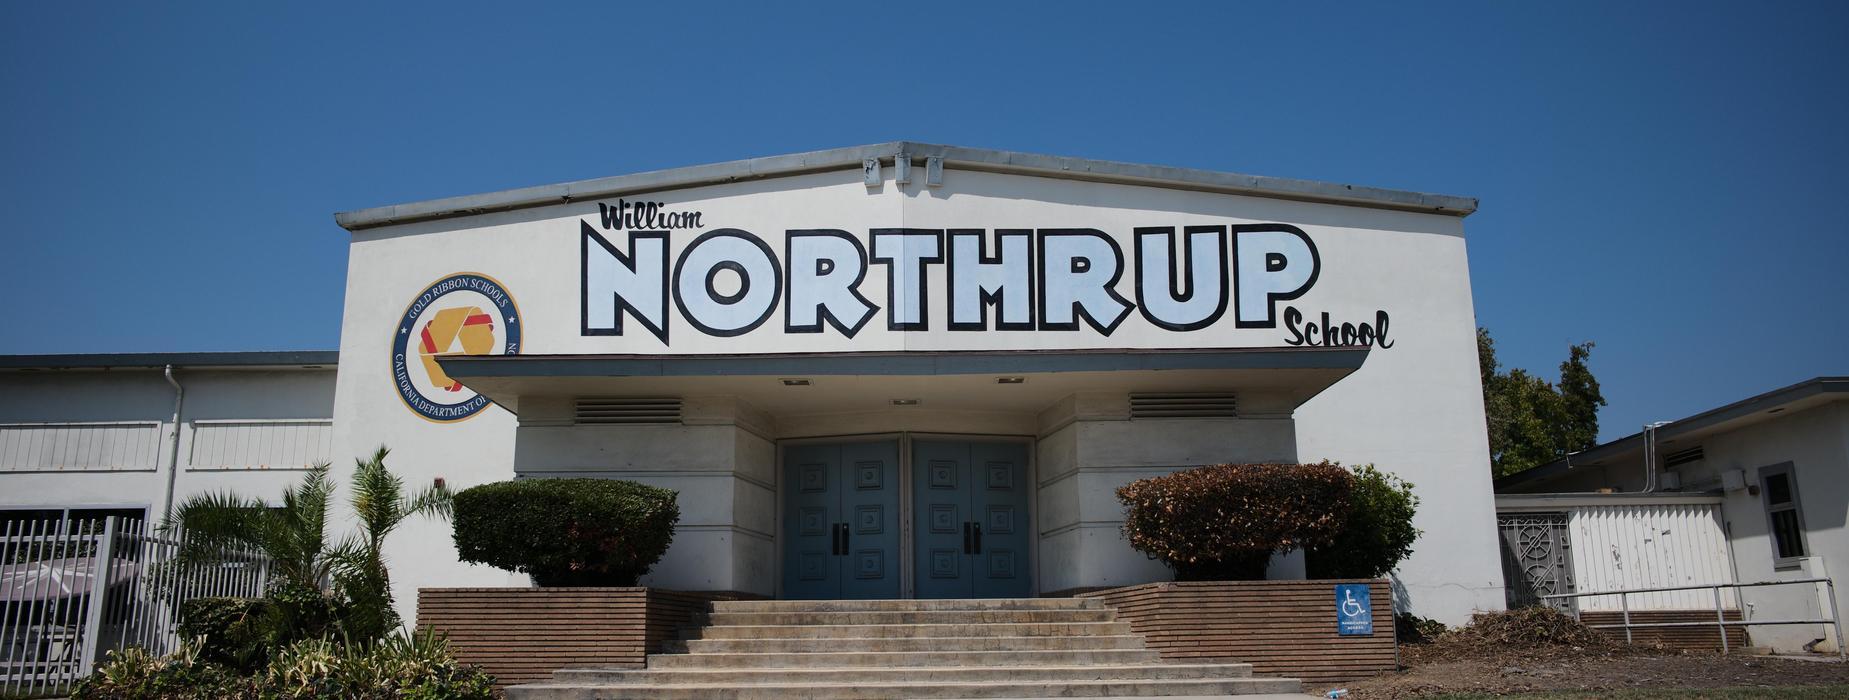 Northrup School Artwork along Auditorium